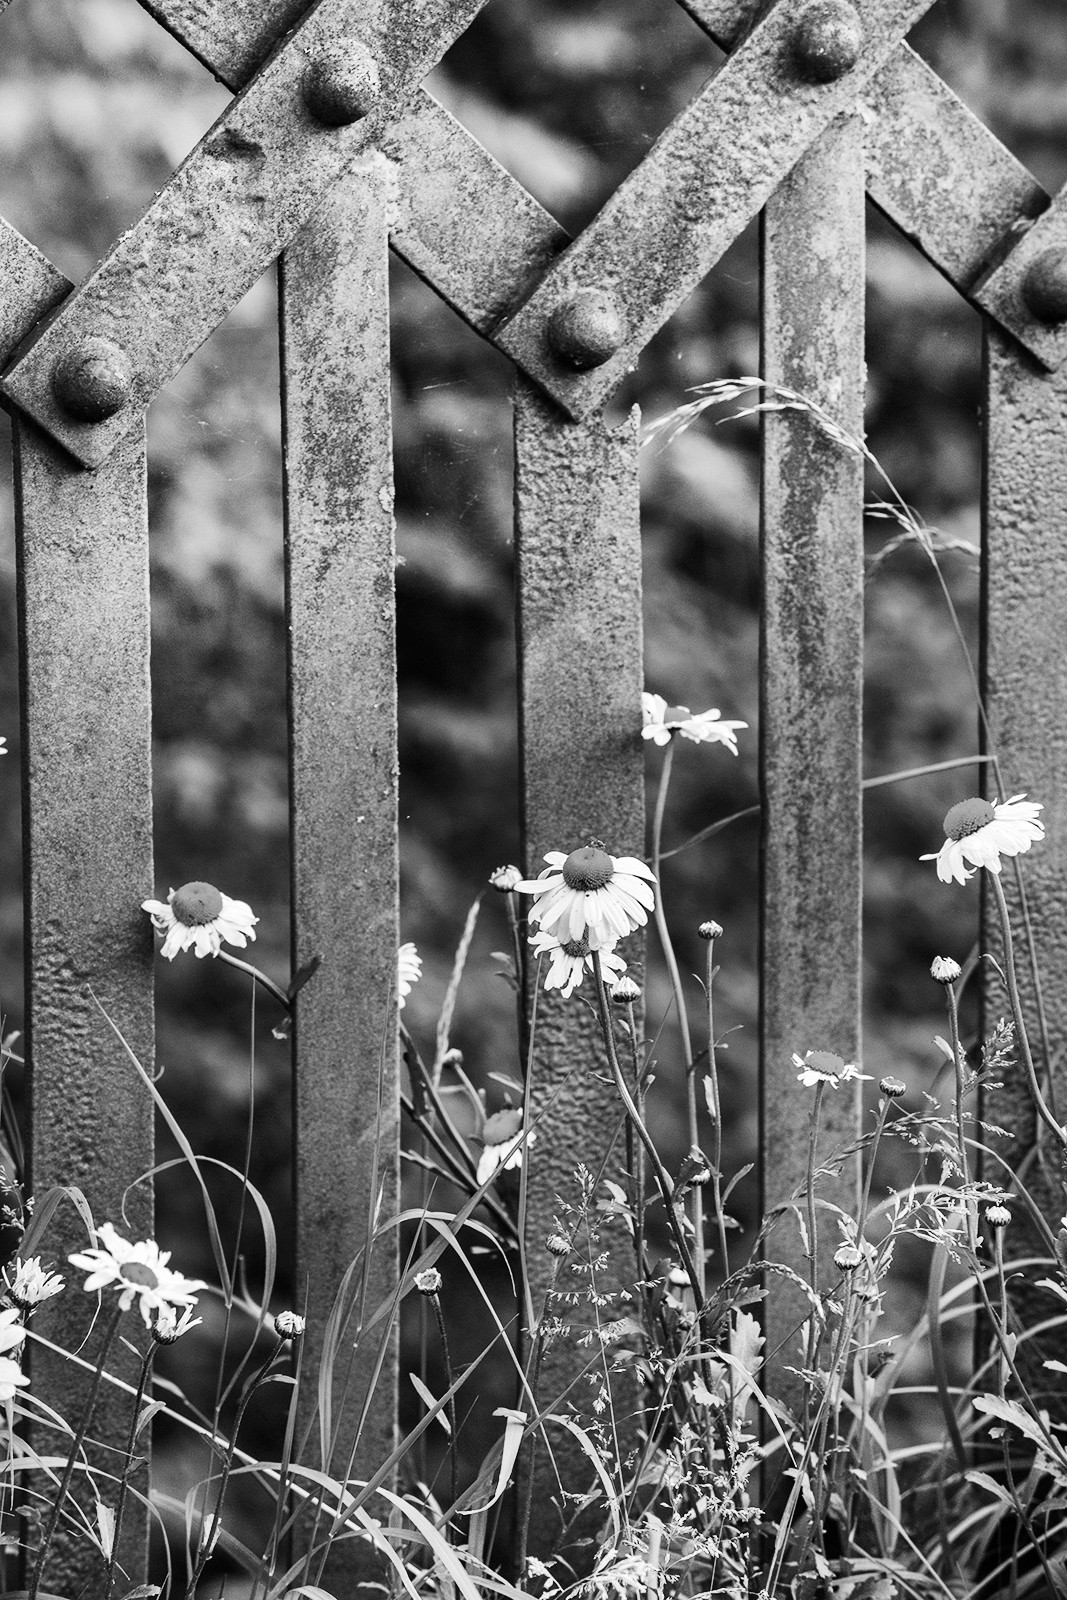 Ox-eye daisies (Leucanthemum vulgareand railway fence